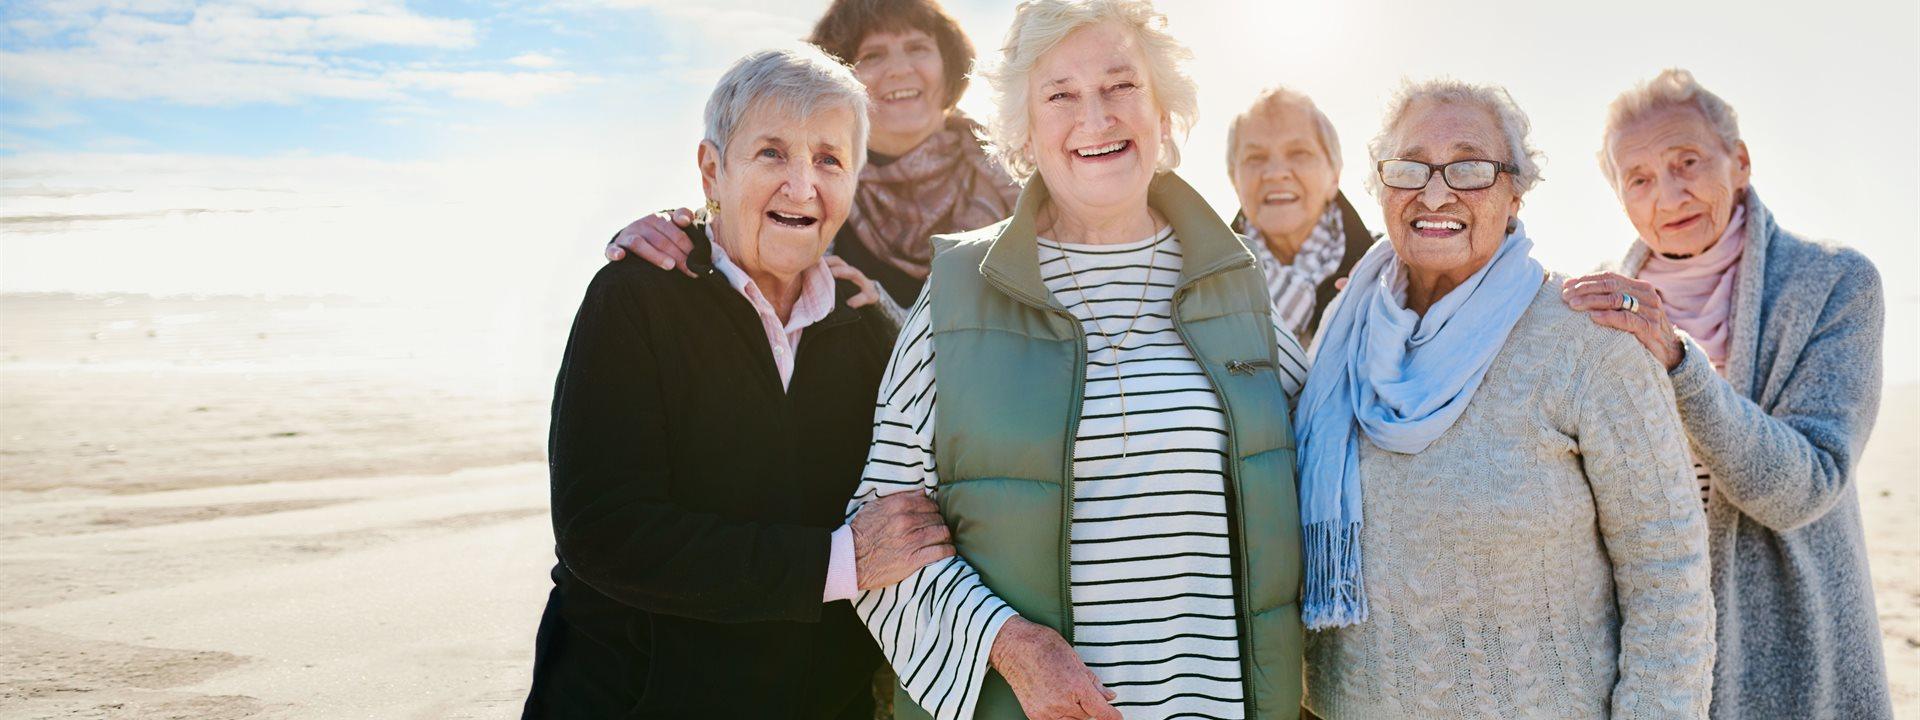 Northern Virginia Senior Living Options